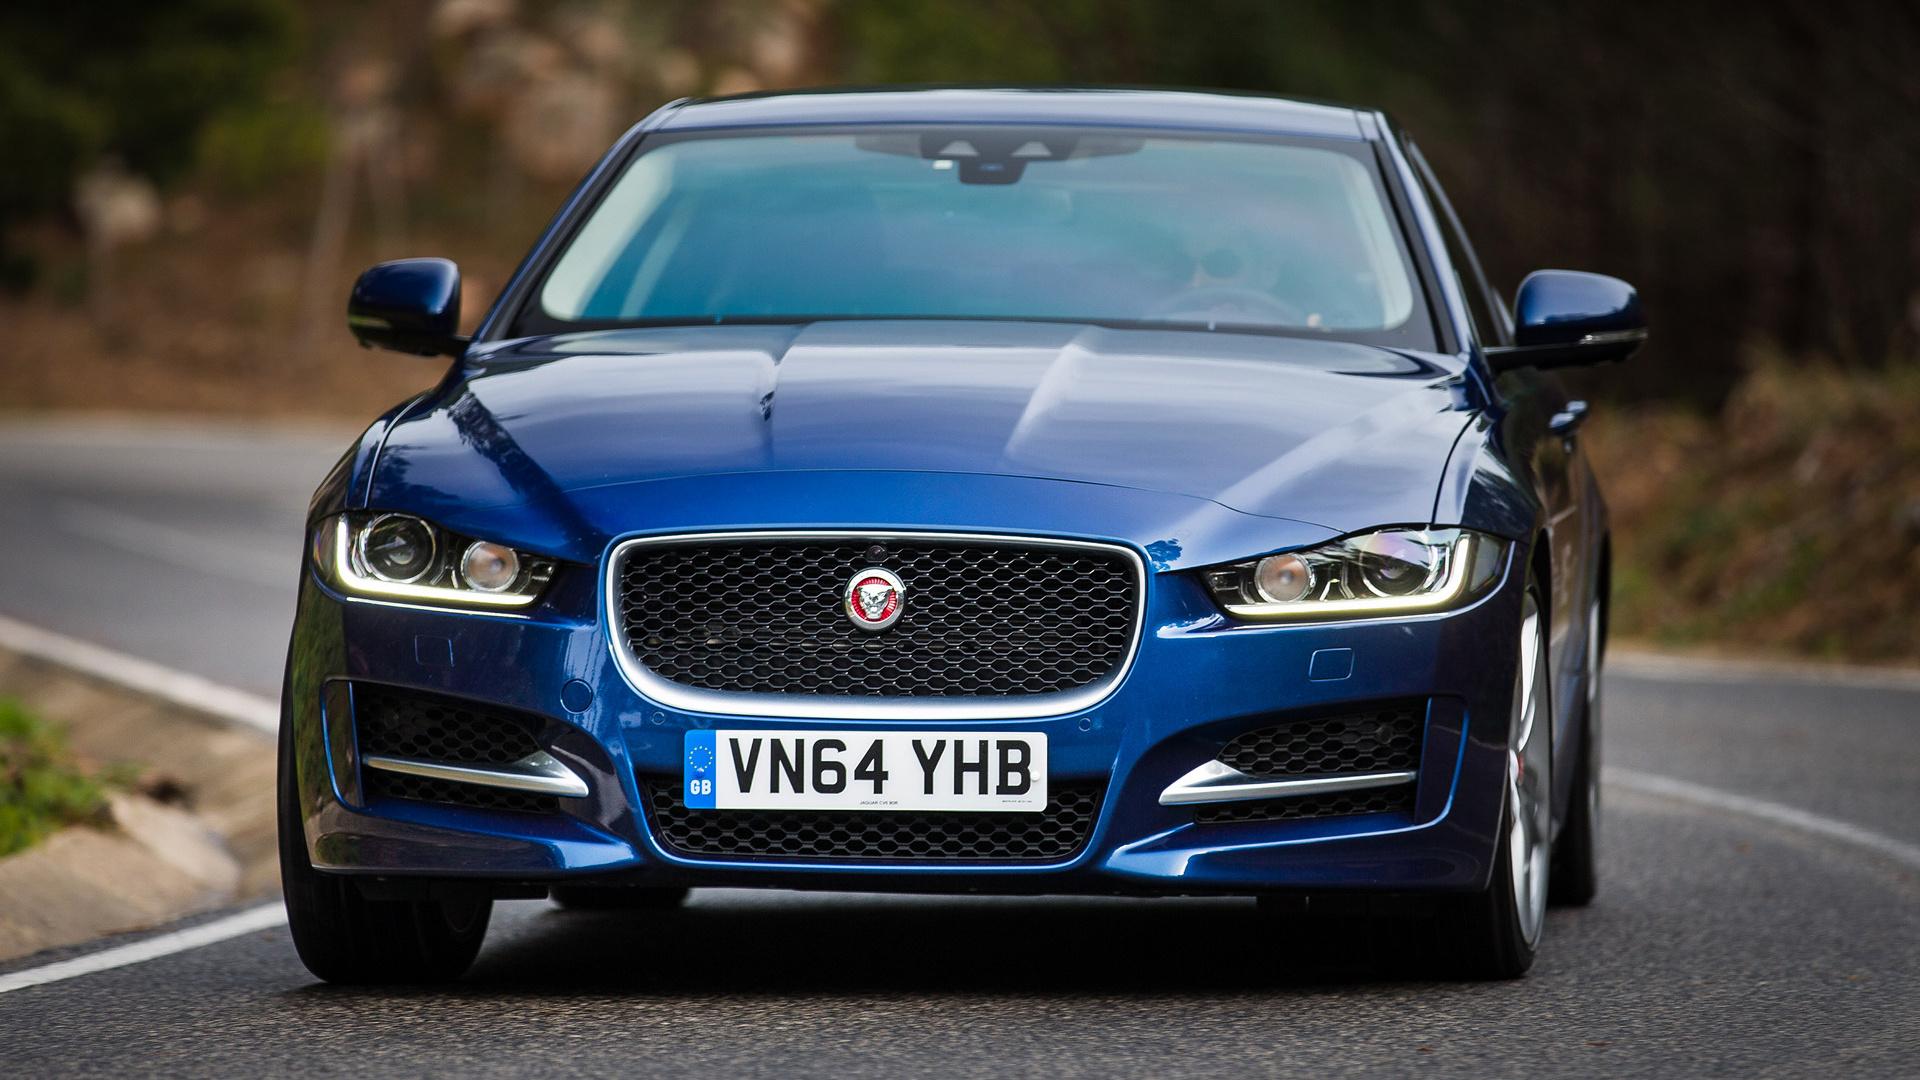 2015 Jaguar XE R-Sport - Wallpapers and HD Images   Car Pixel